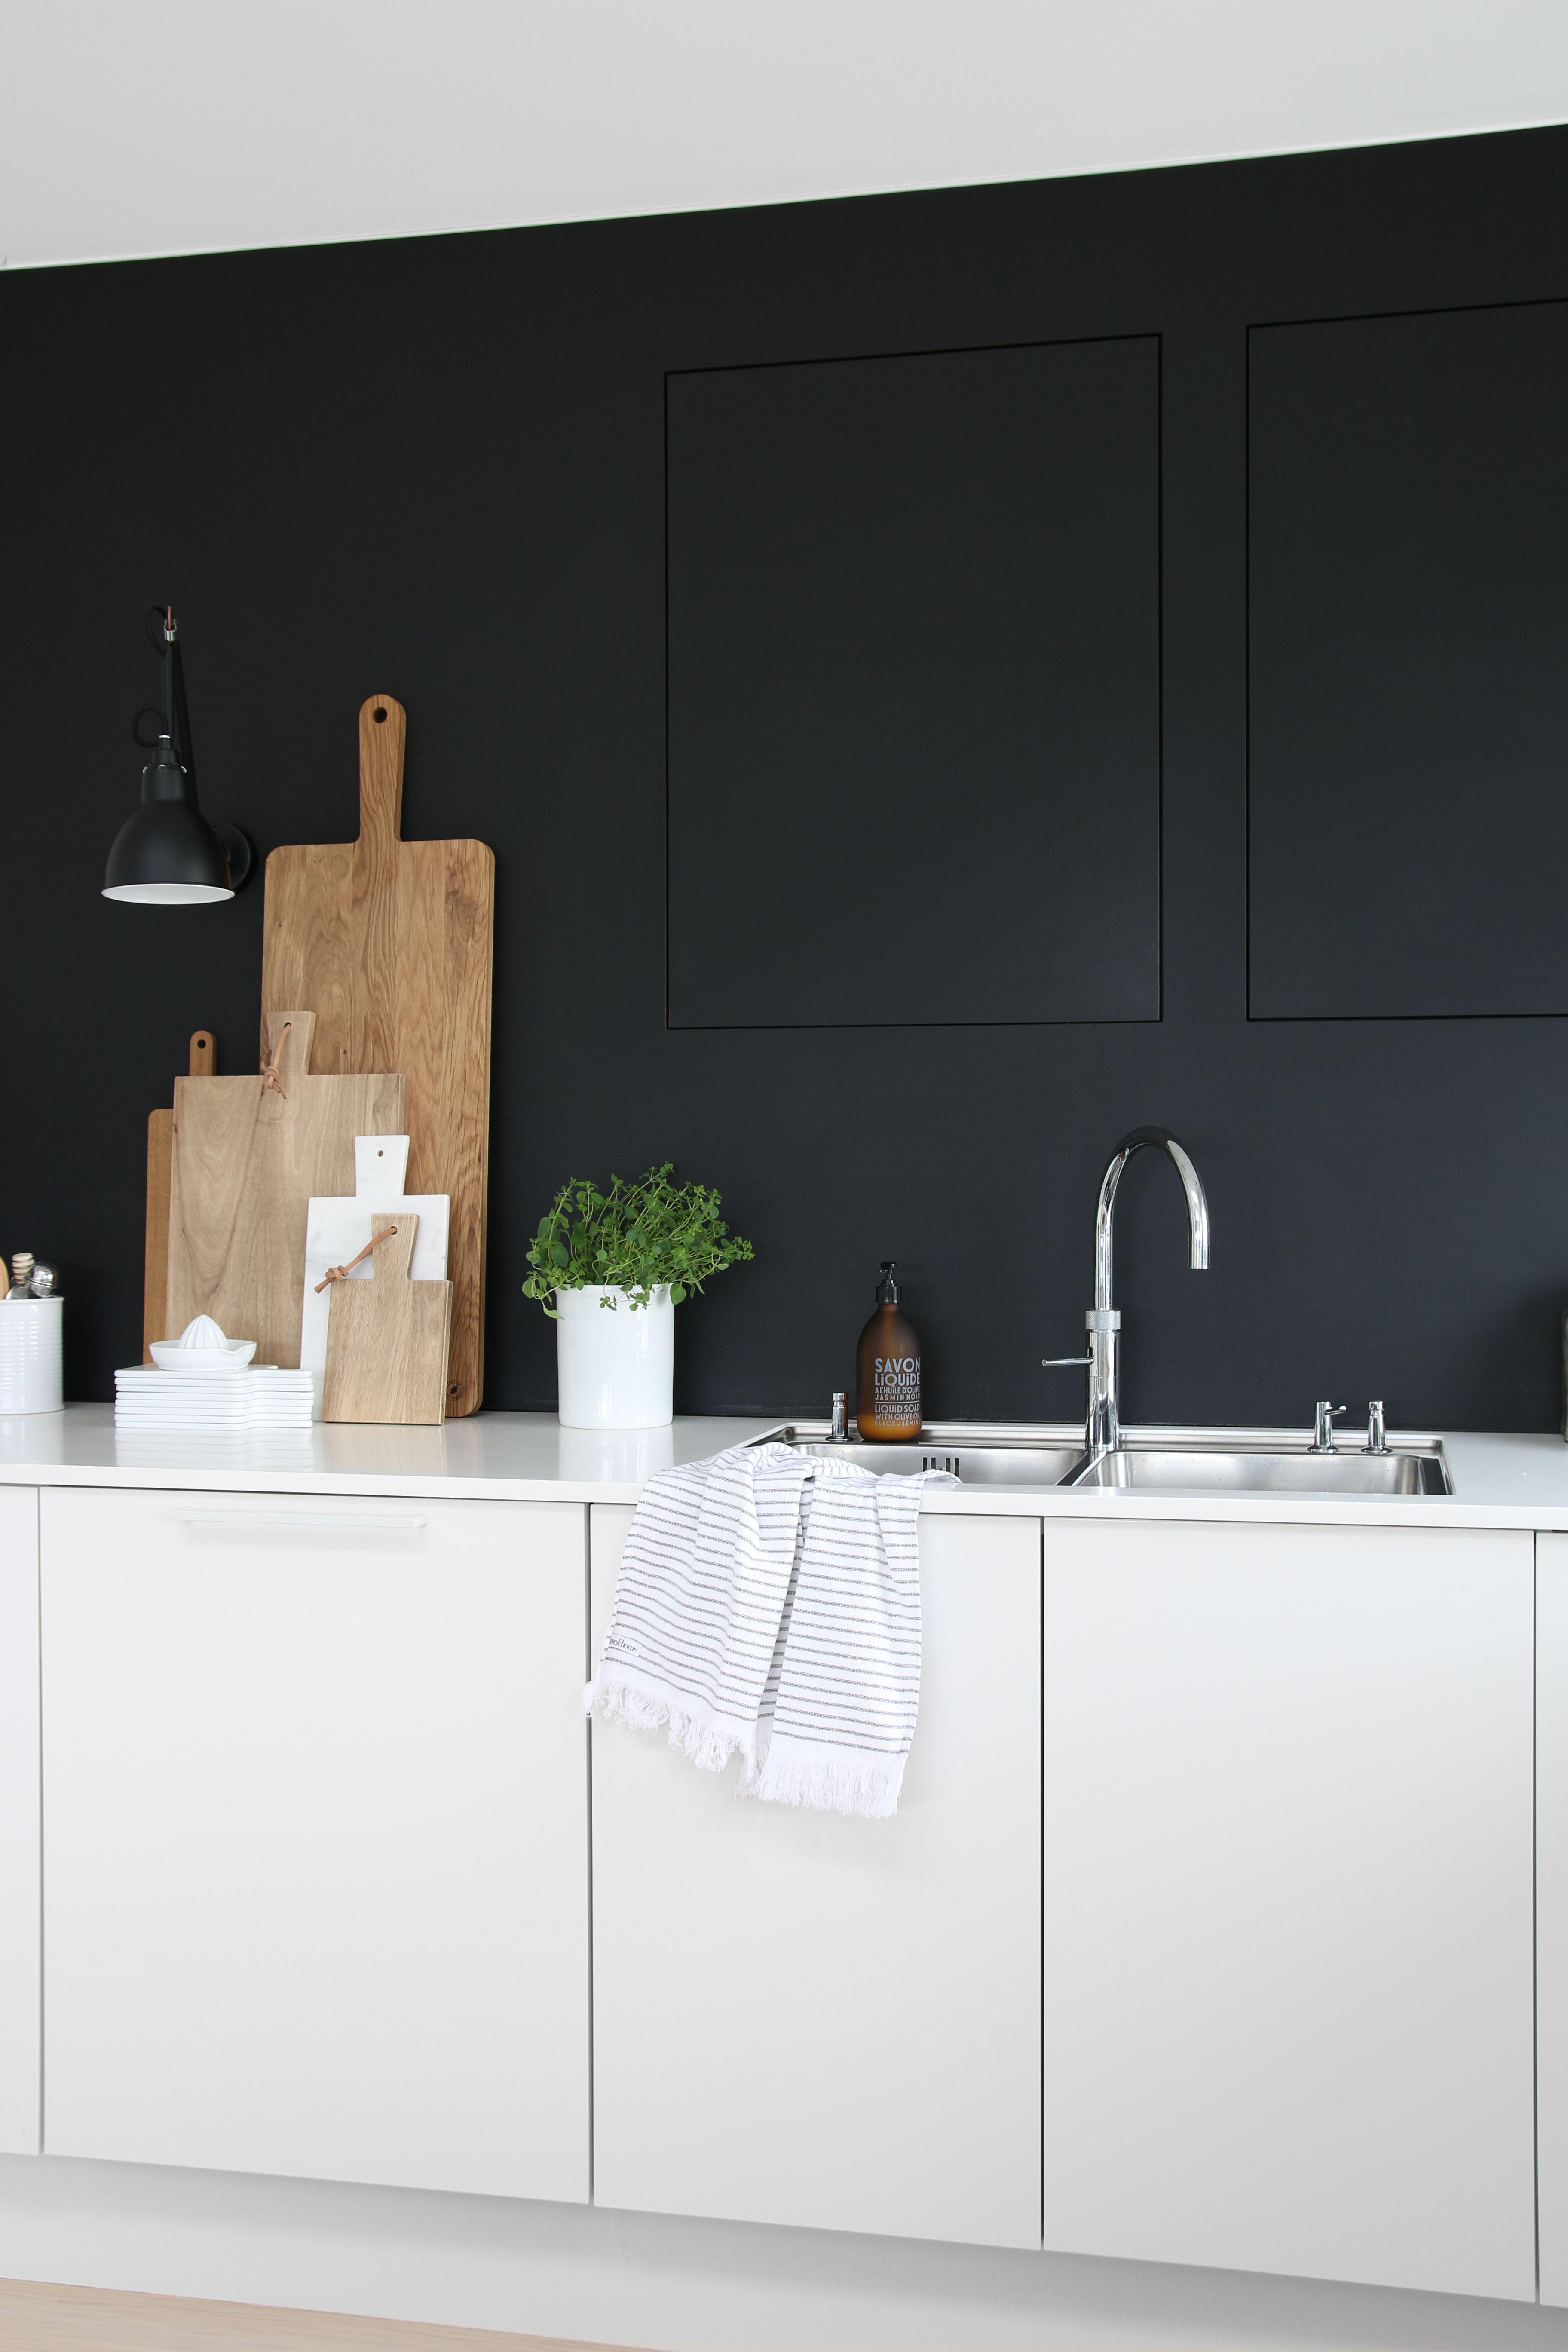 Scandinavian kitchen vignette | wooden cutting board\'s | black and ...